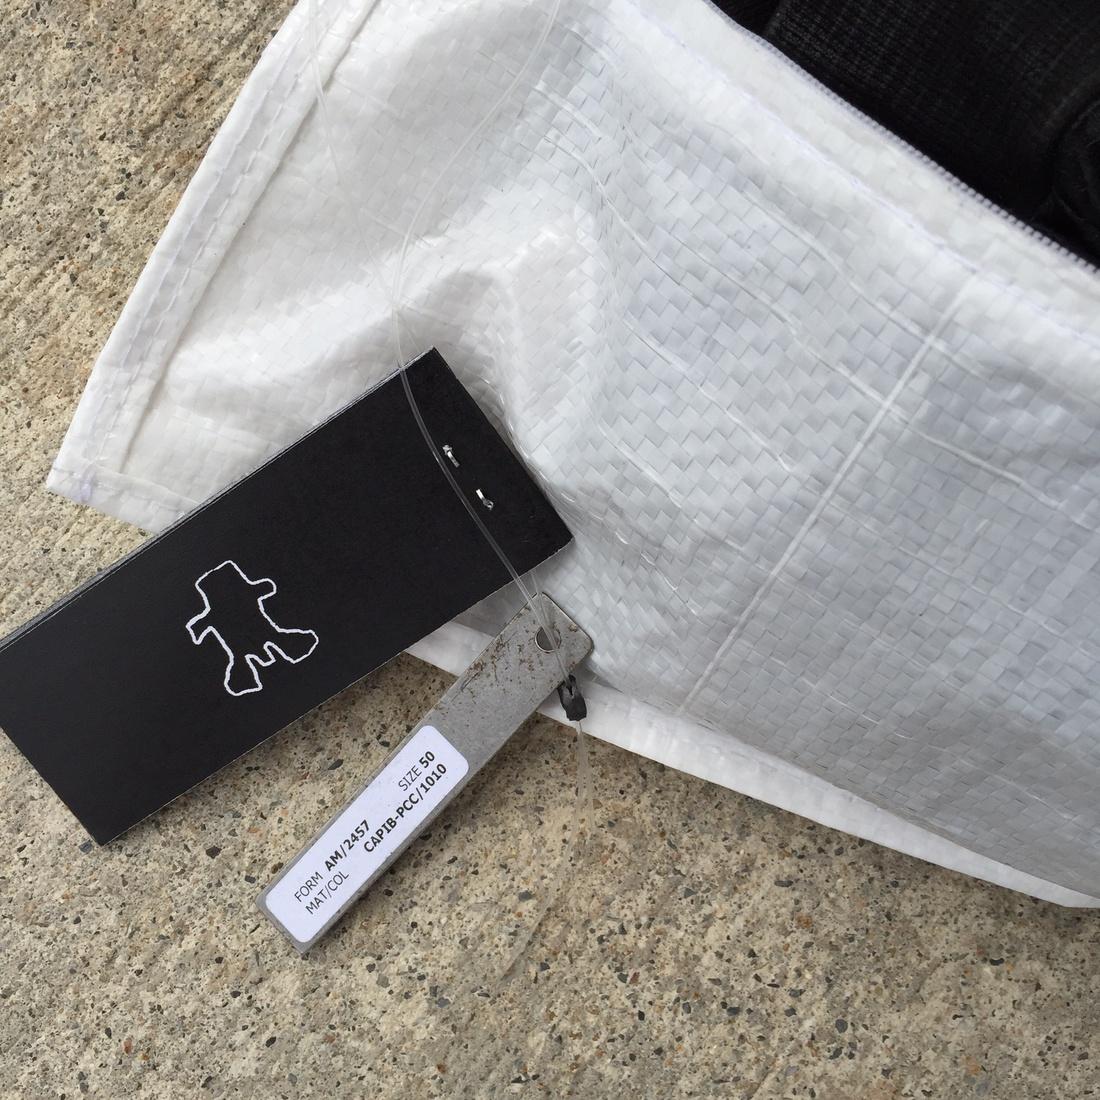 Black leather cut off gloves -  Carol Christian Poell Black Leather Cut Off Gloves Size 40 3